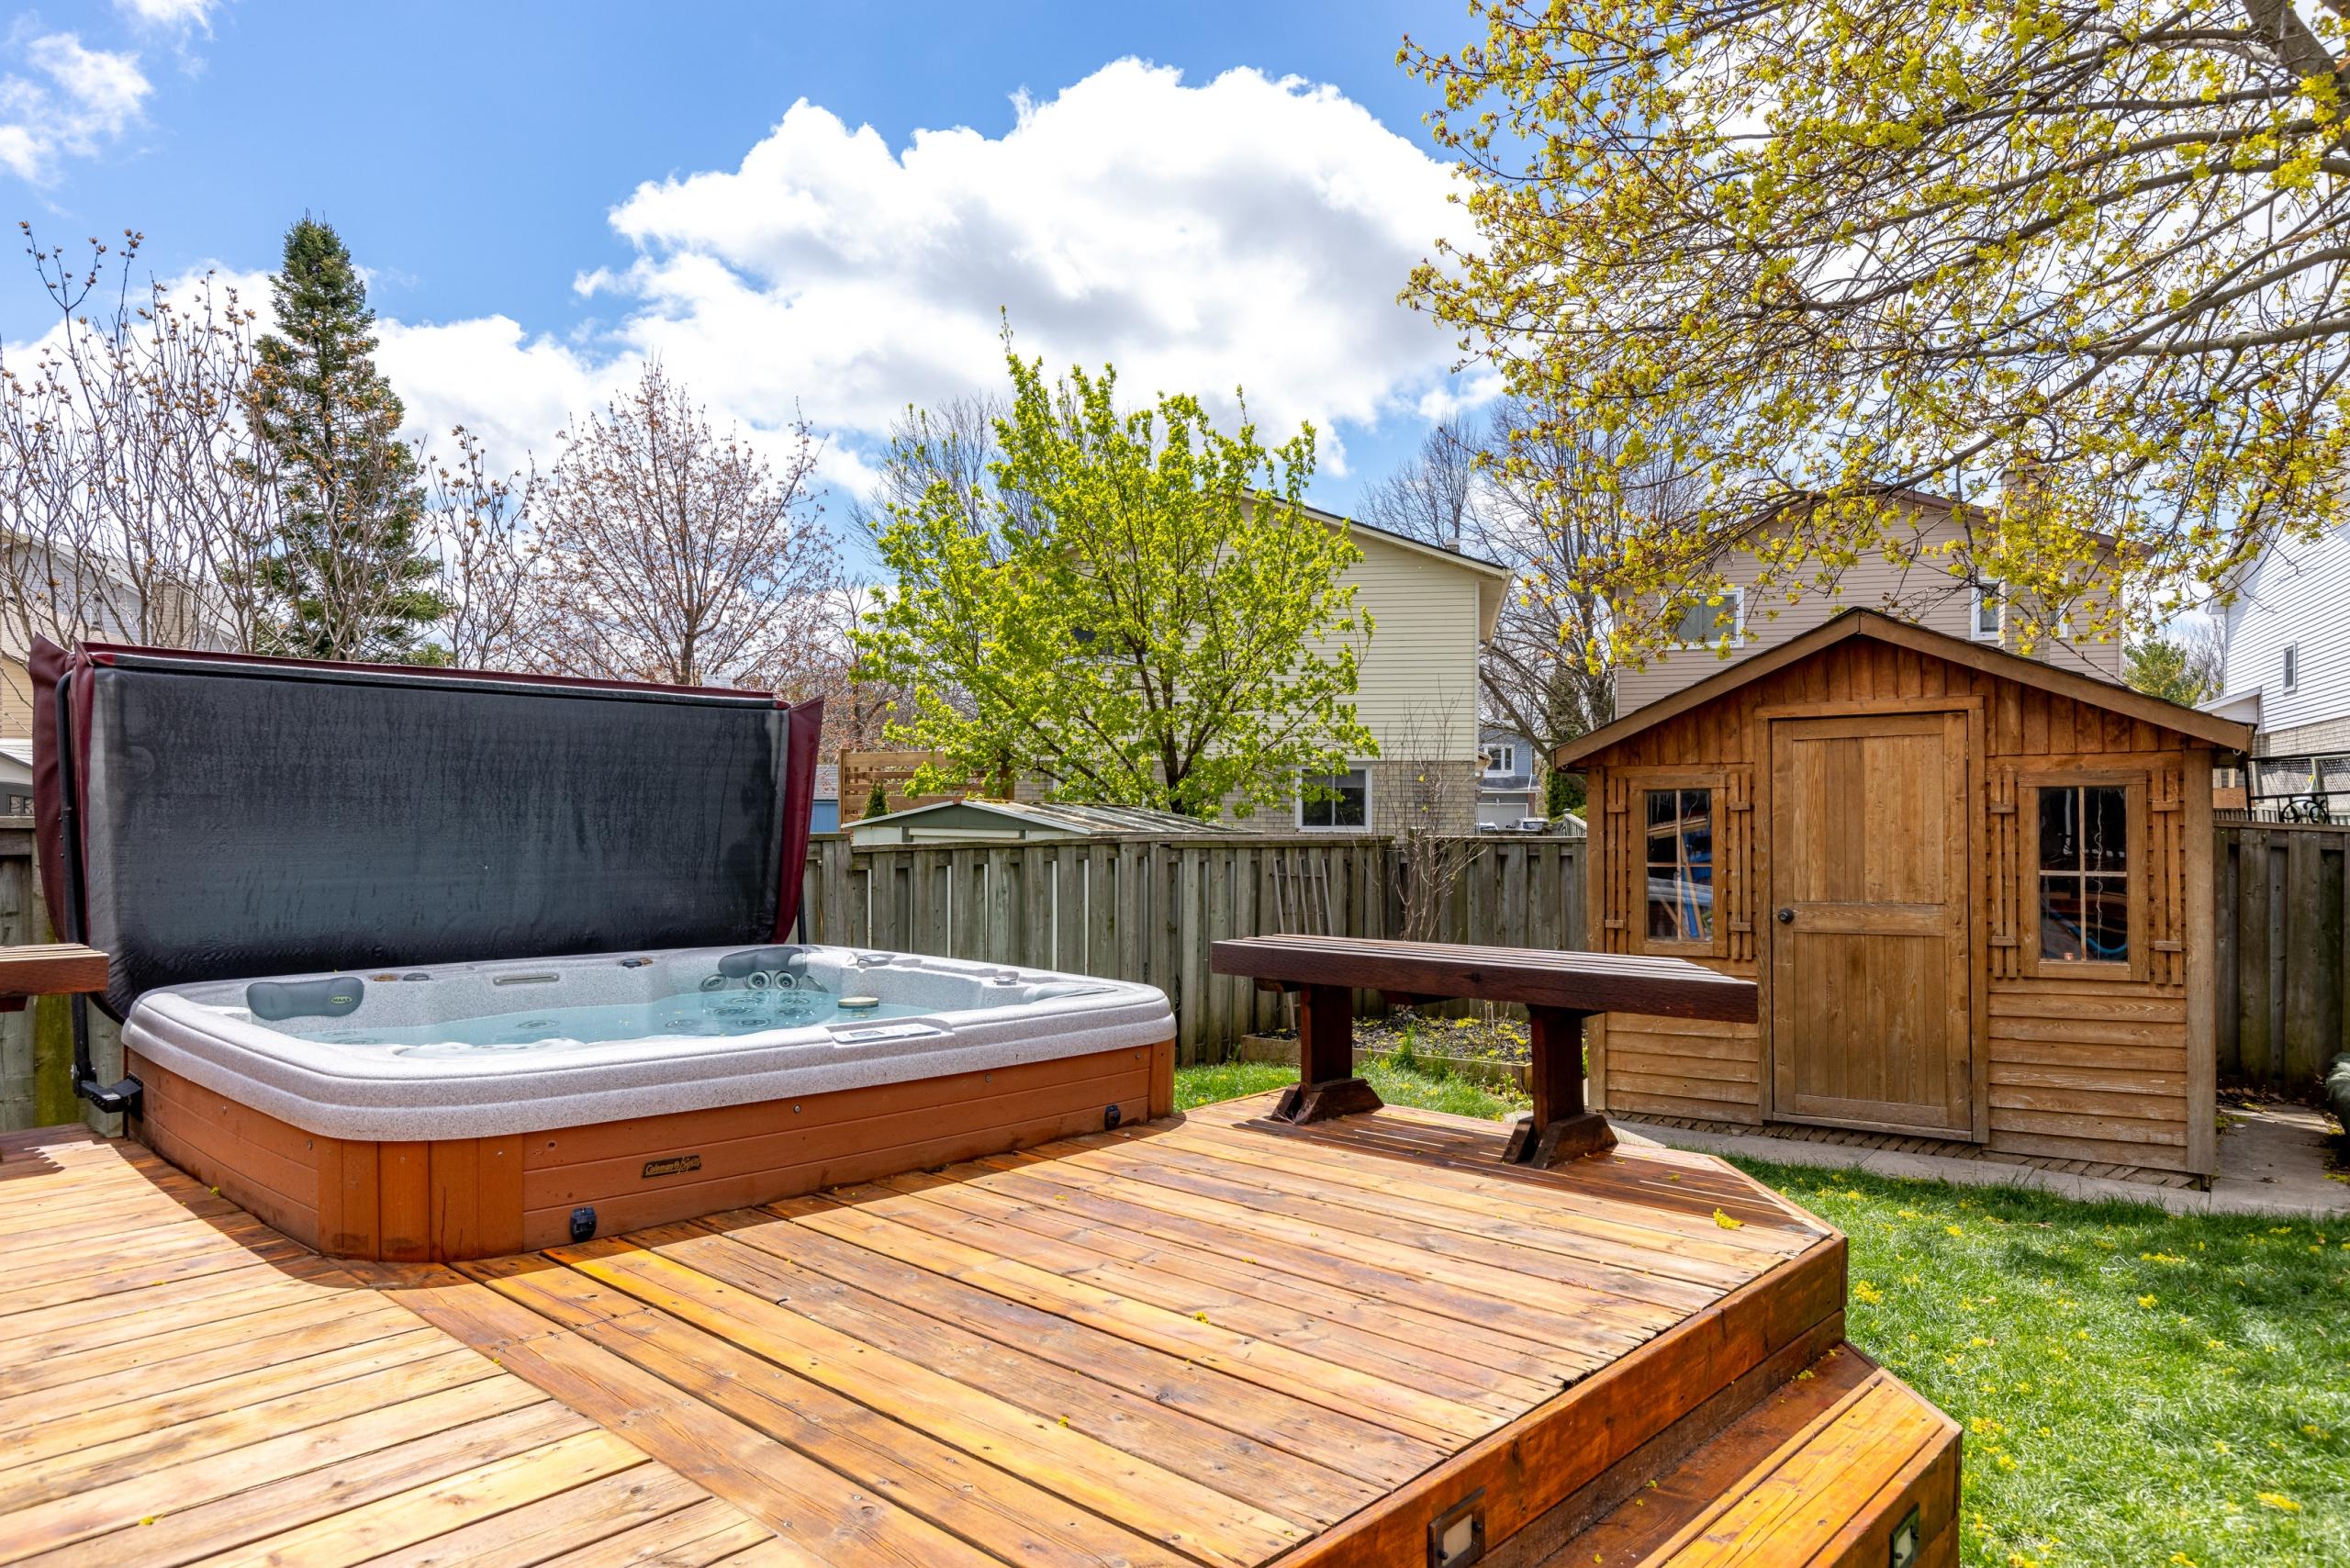 Swimming pool featured at 3505 Quilter Court, Burlington, ON at Alex Irish & Associates